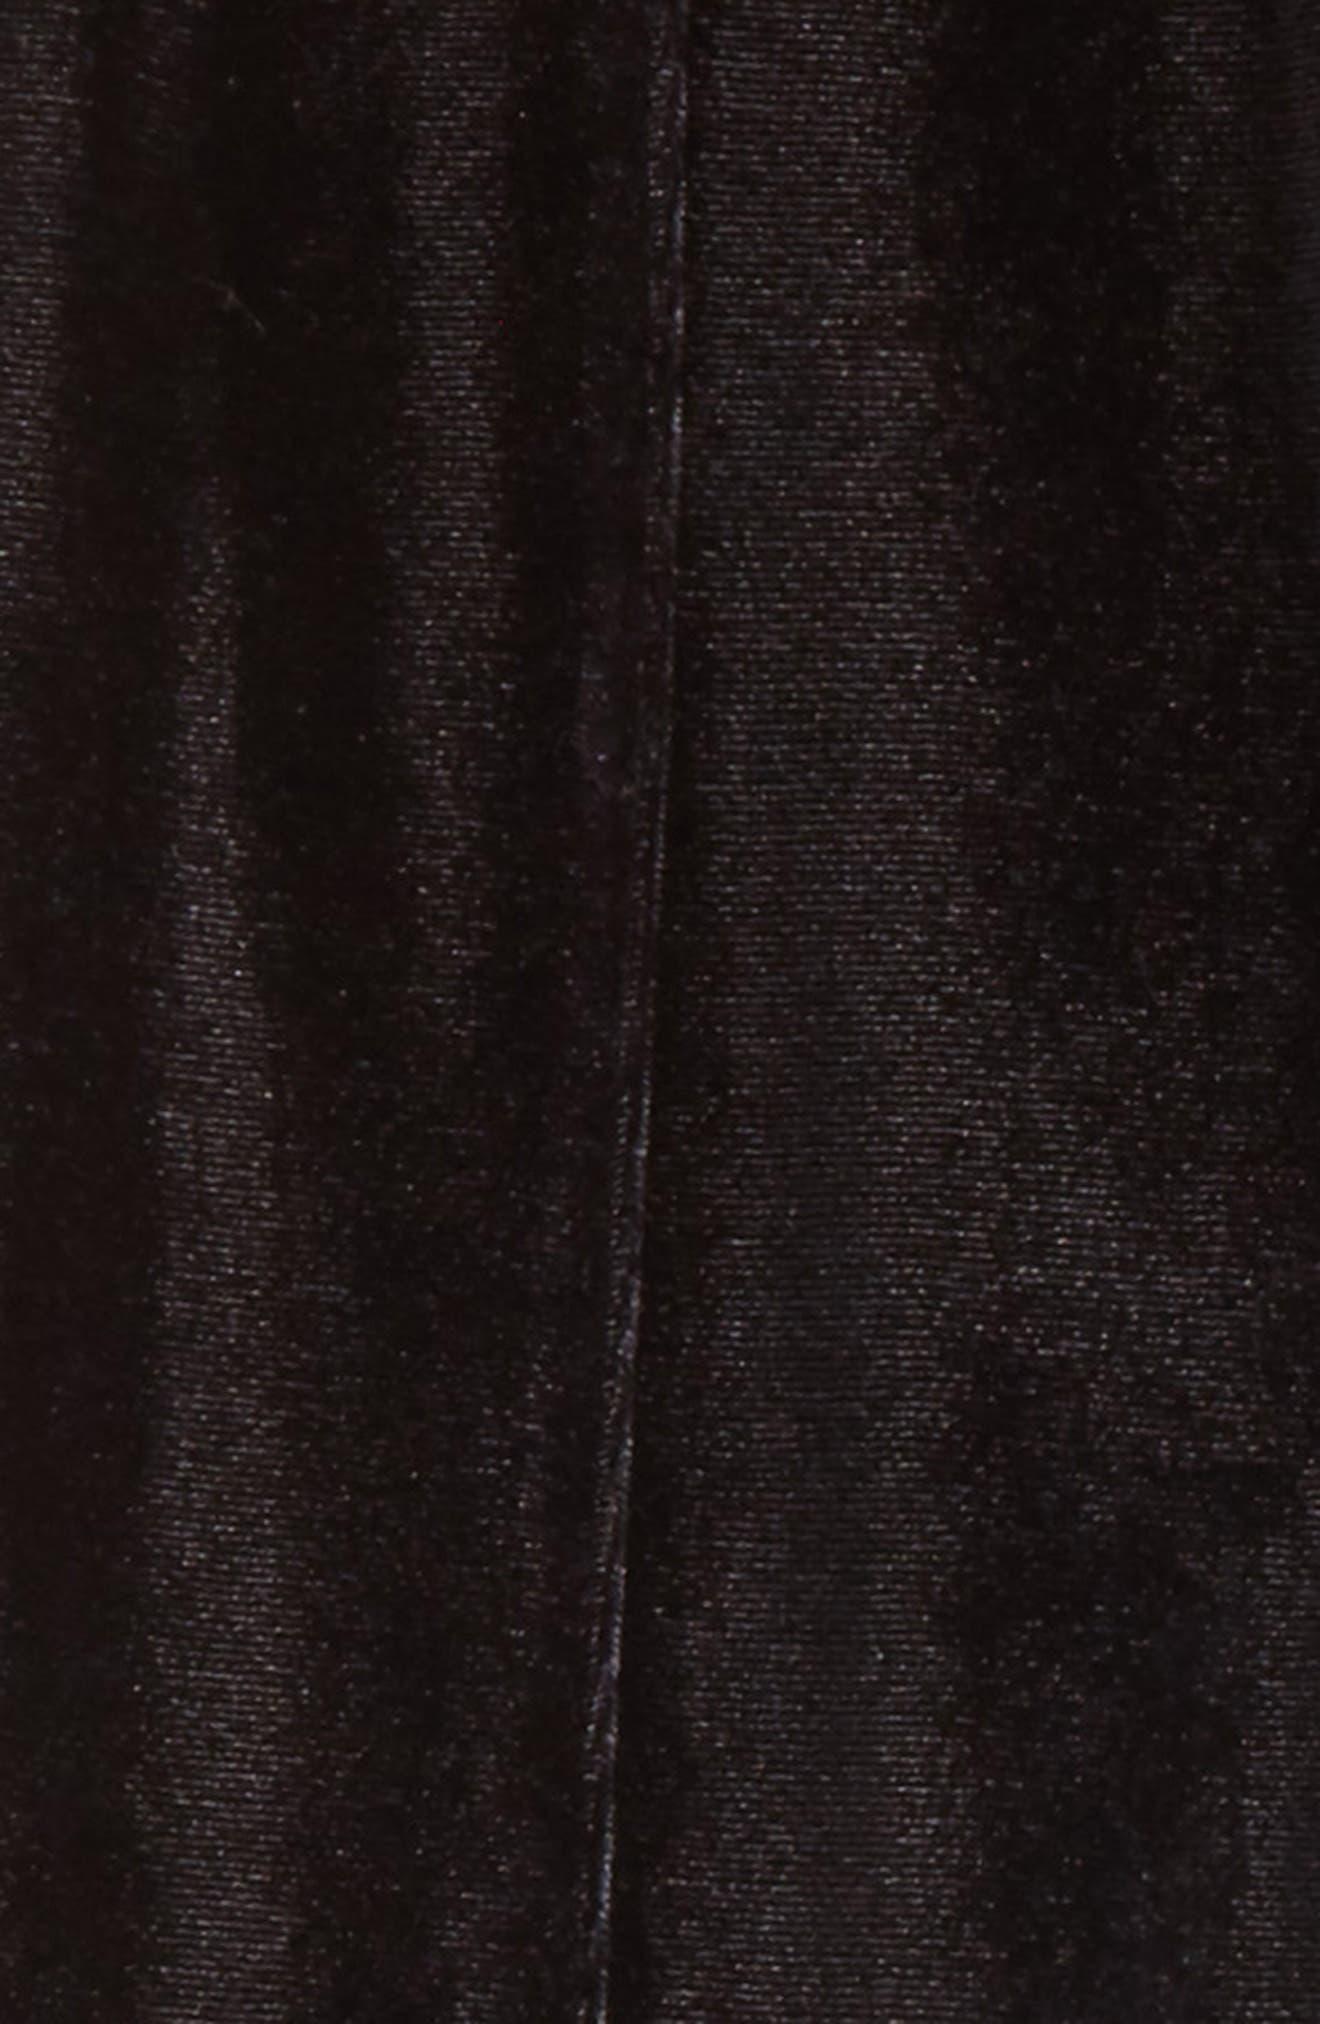 Velvet Stirrup Pants,                             Alternate thumbnail 2, color,                             001